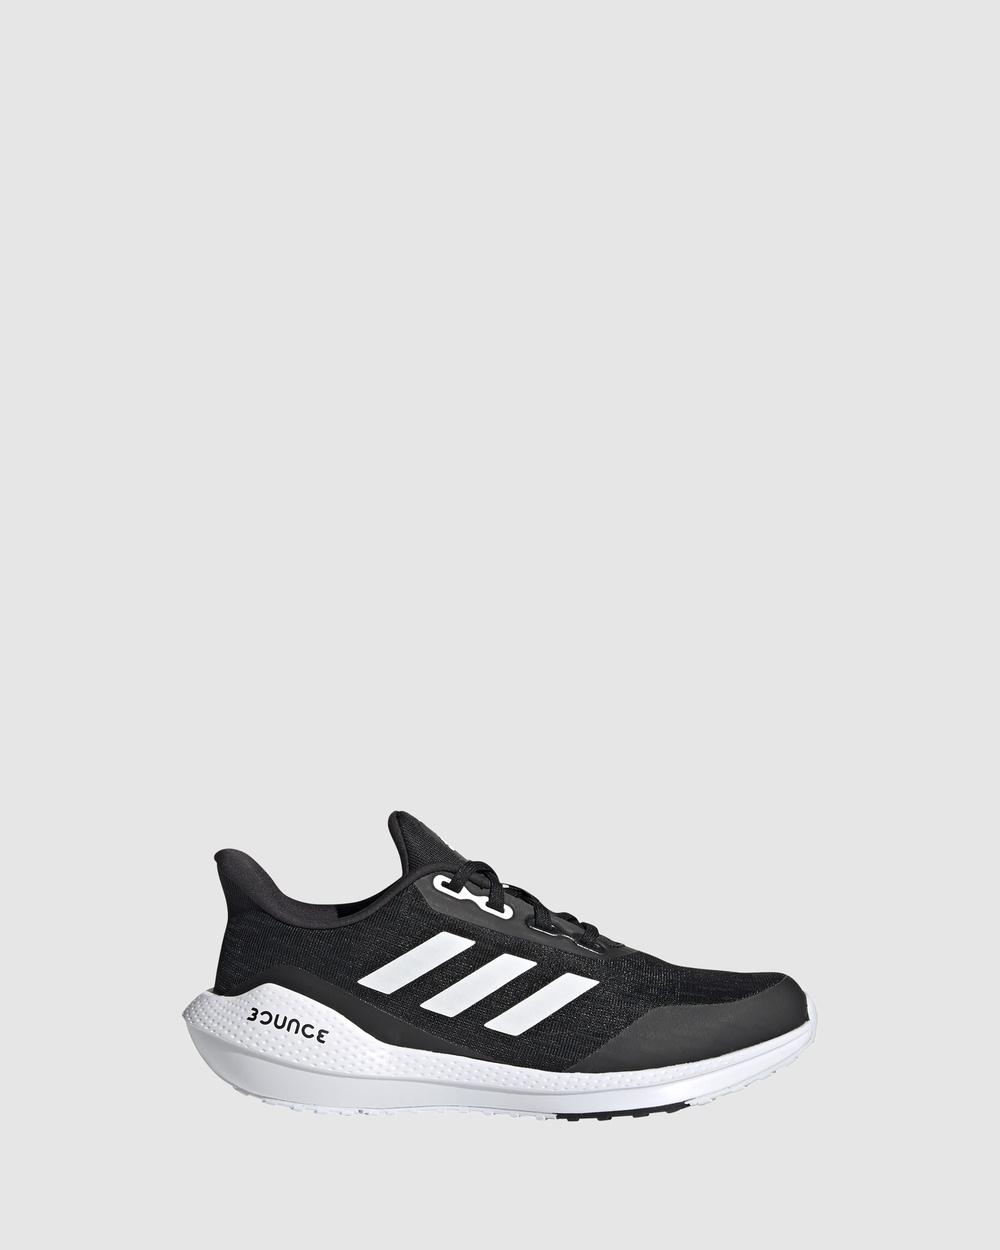 adidas Performance EQ21 Run Grade School Lifestyle Shoes Black/White/Black